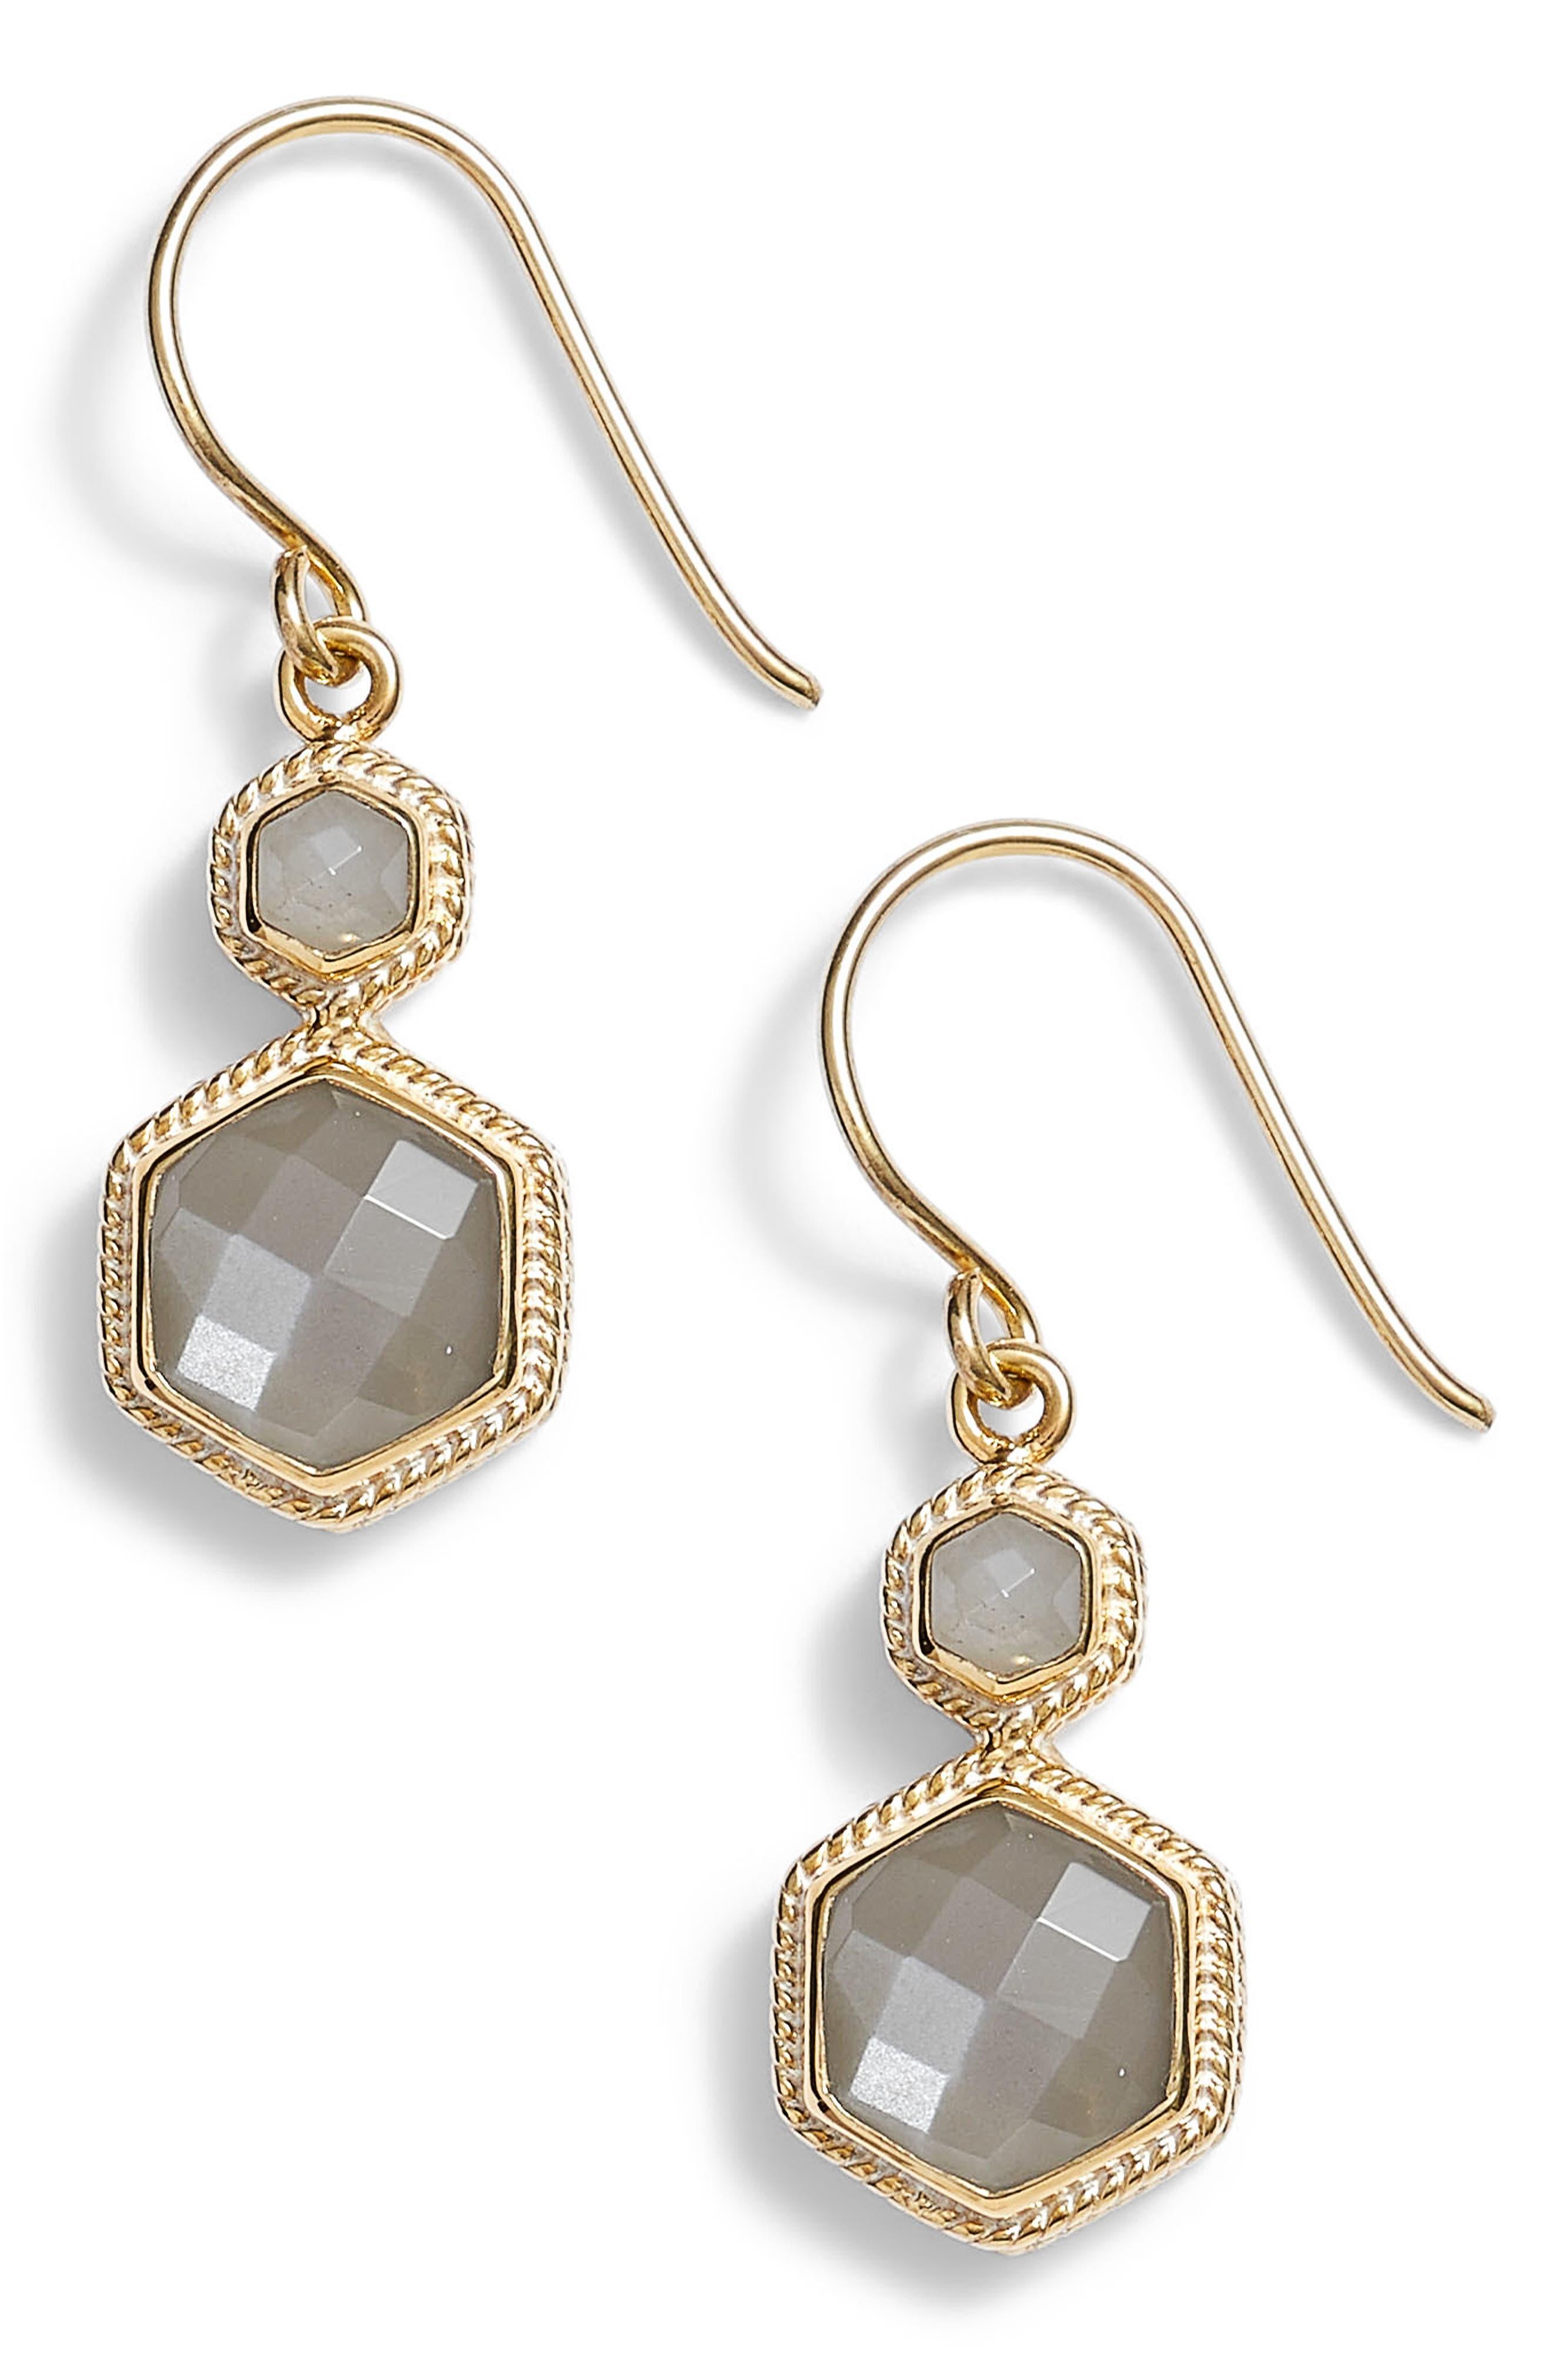 Grey Moonstone Double Drop Earrings,                             Main thumbnail 1, color,                             Gold/ Grey Moonstone